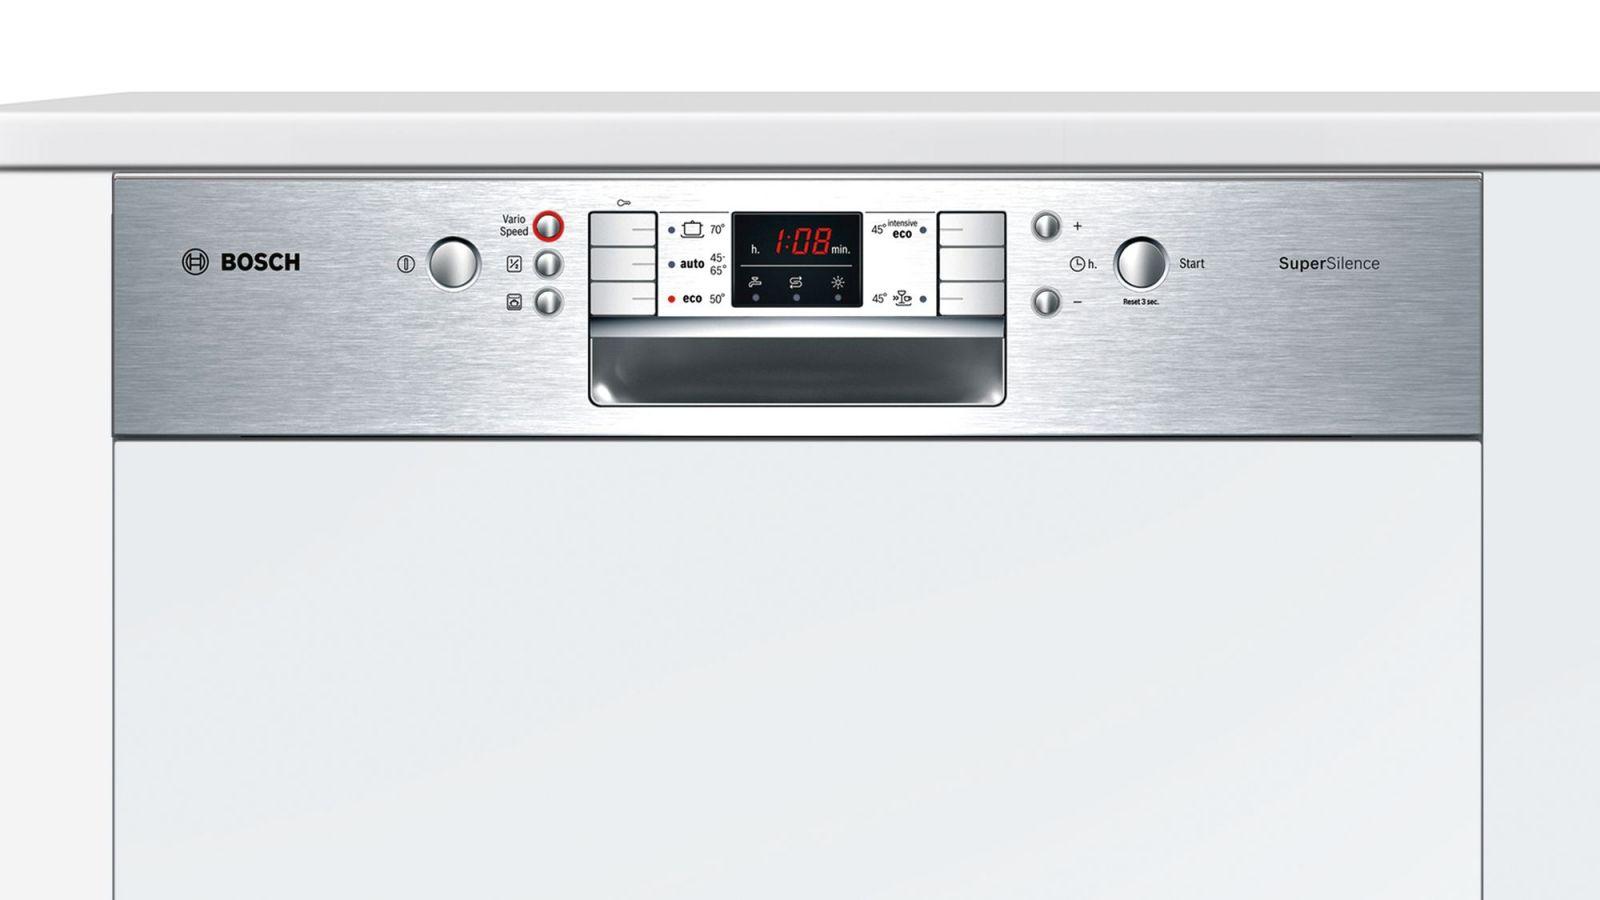 Máy rửa bát bán âm Bosch HMH.SMI46IS03E 60CM 1